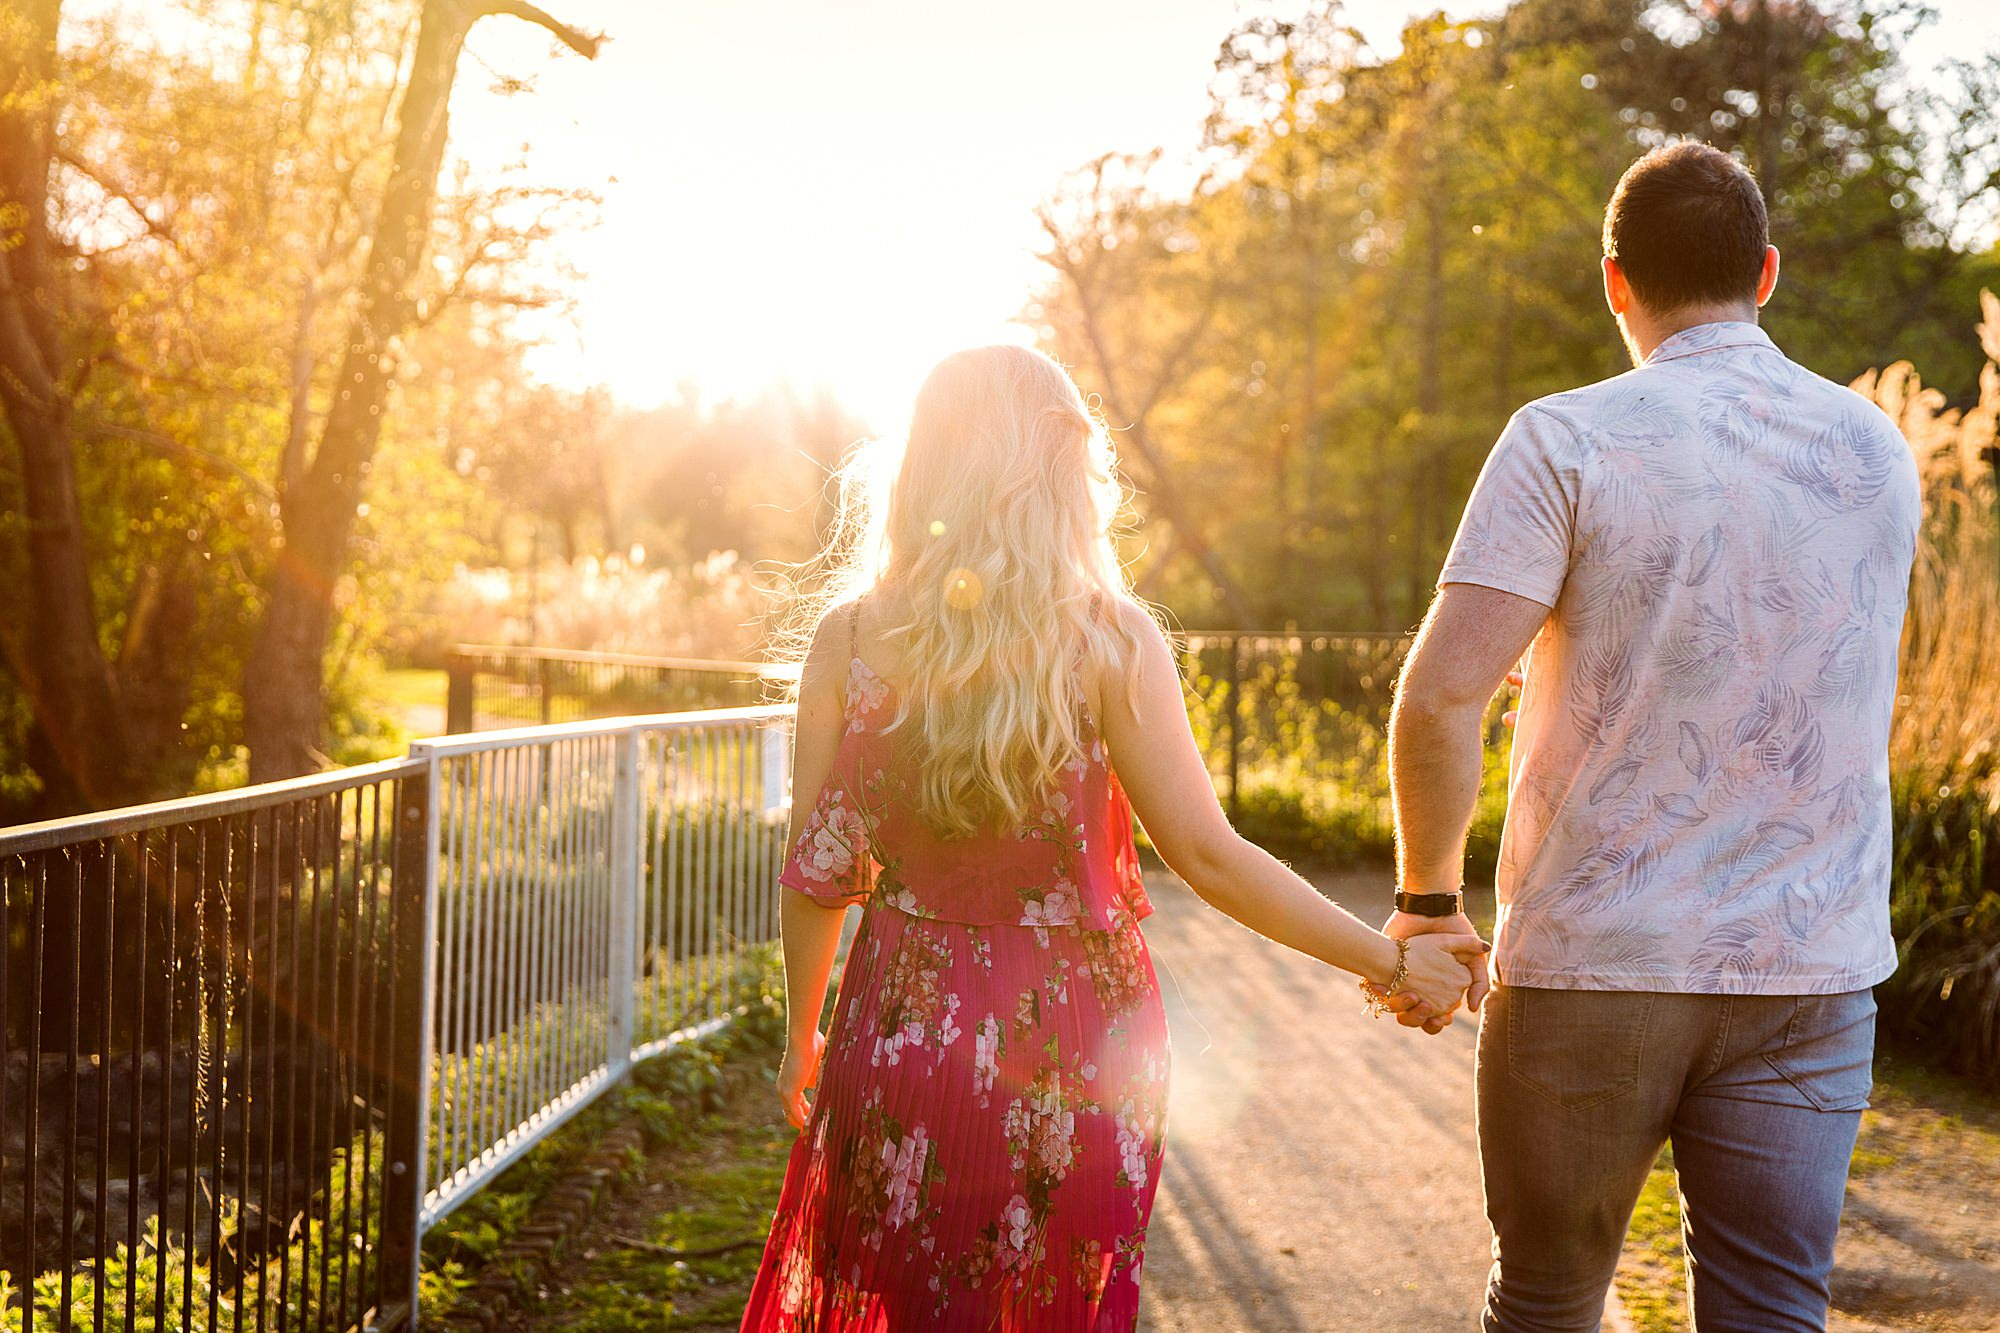 Summer evening engagement shoot couple walking in warm sunlight